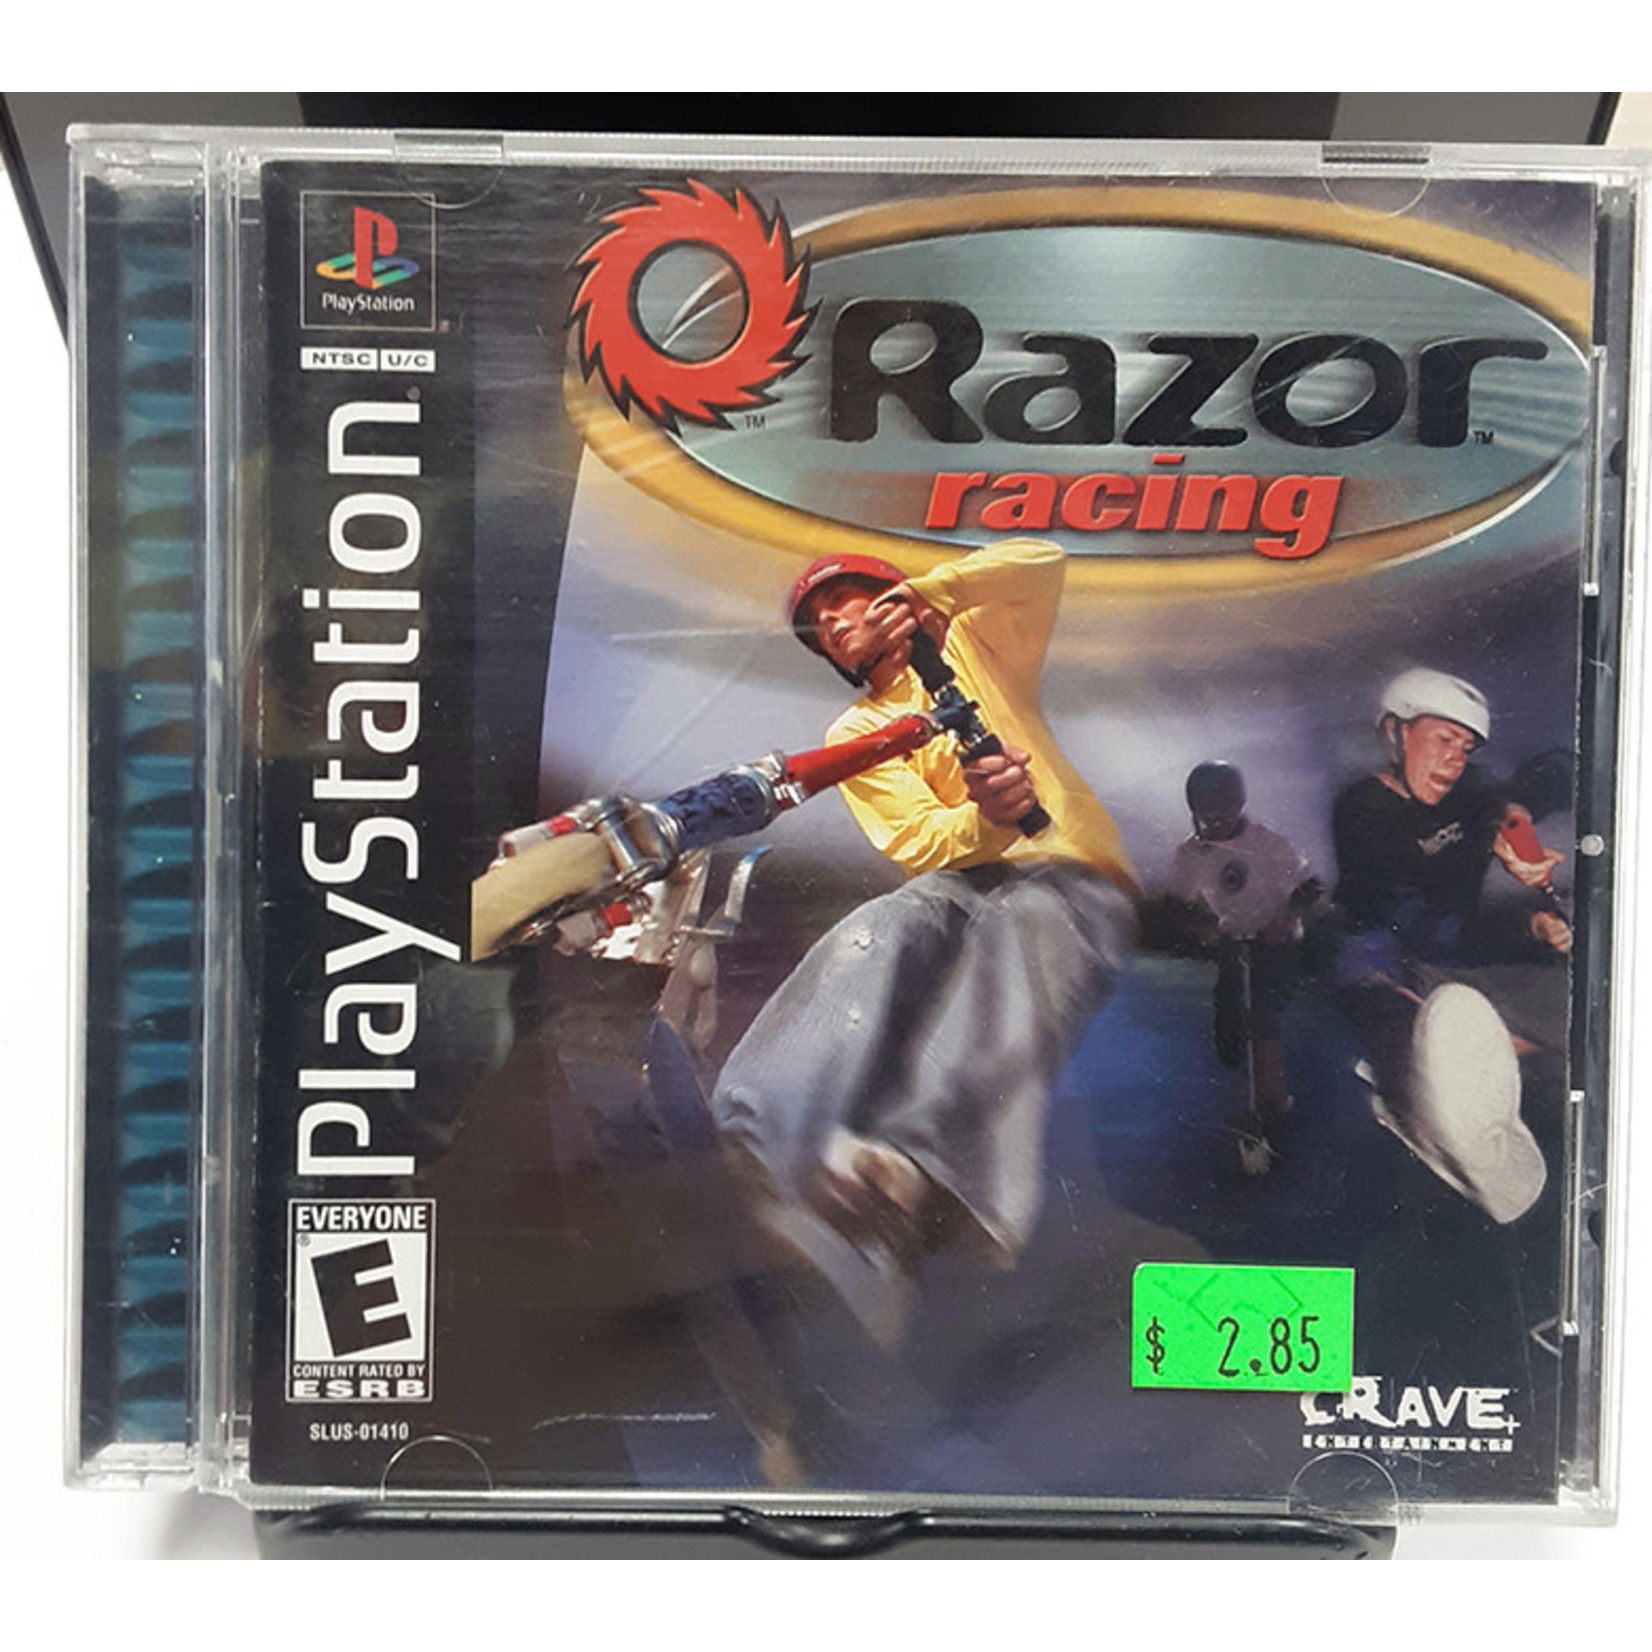 ps1u-razor racing